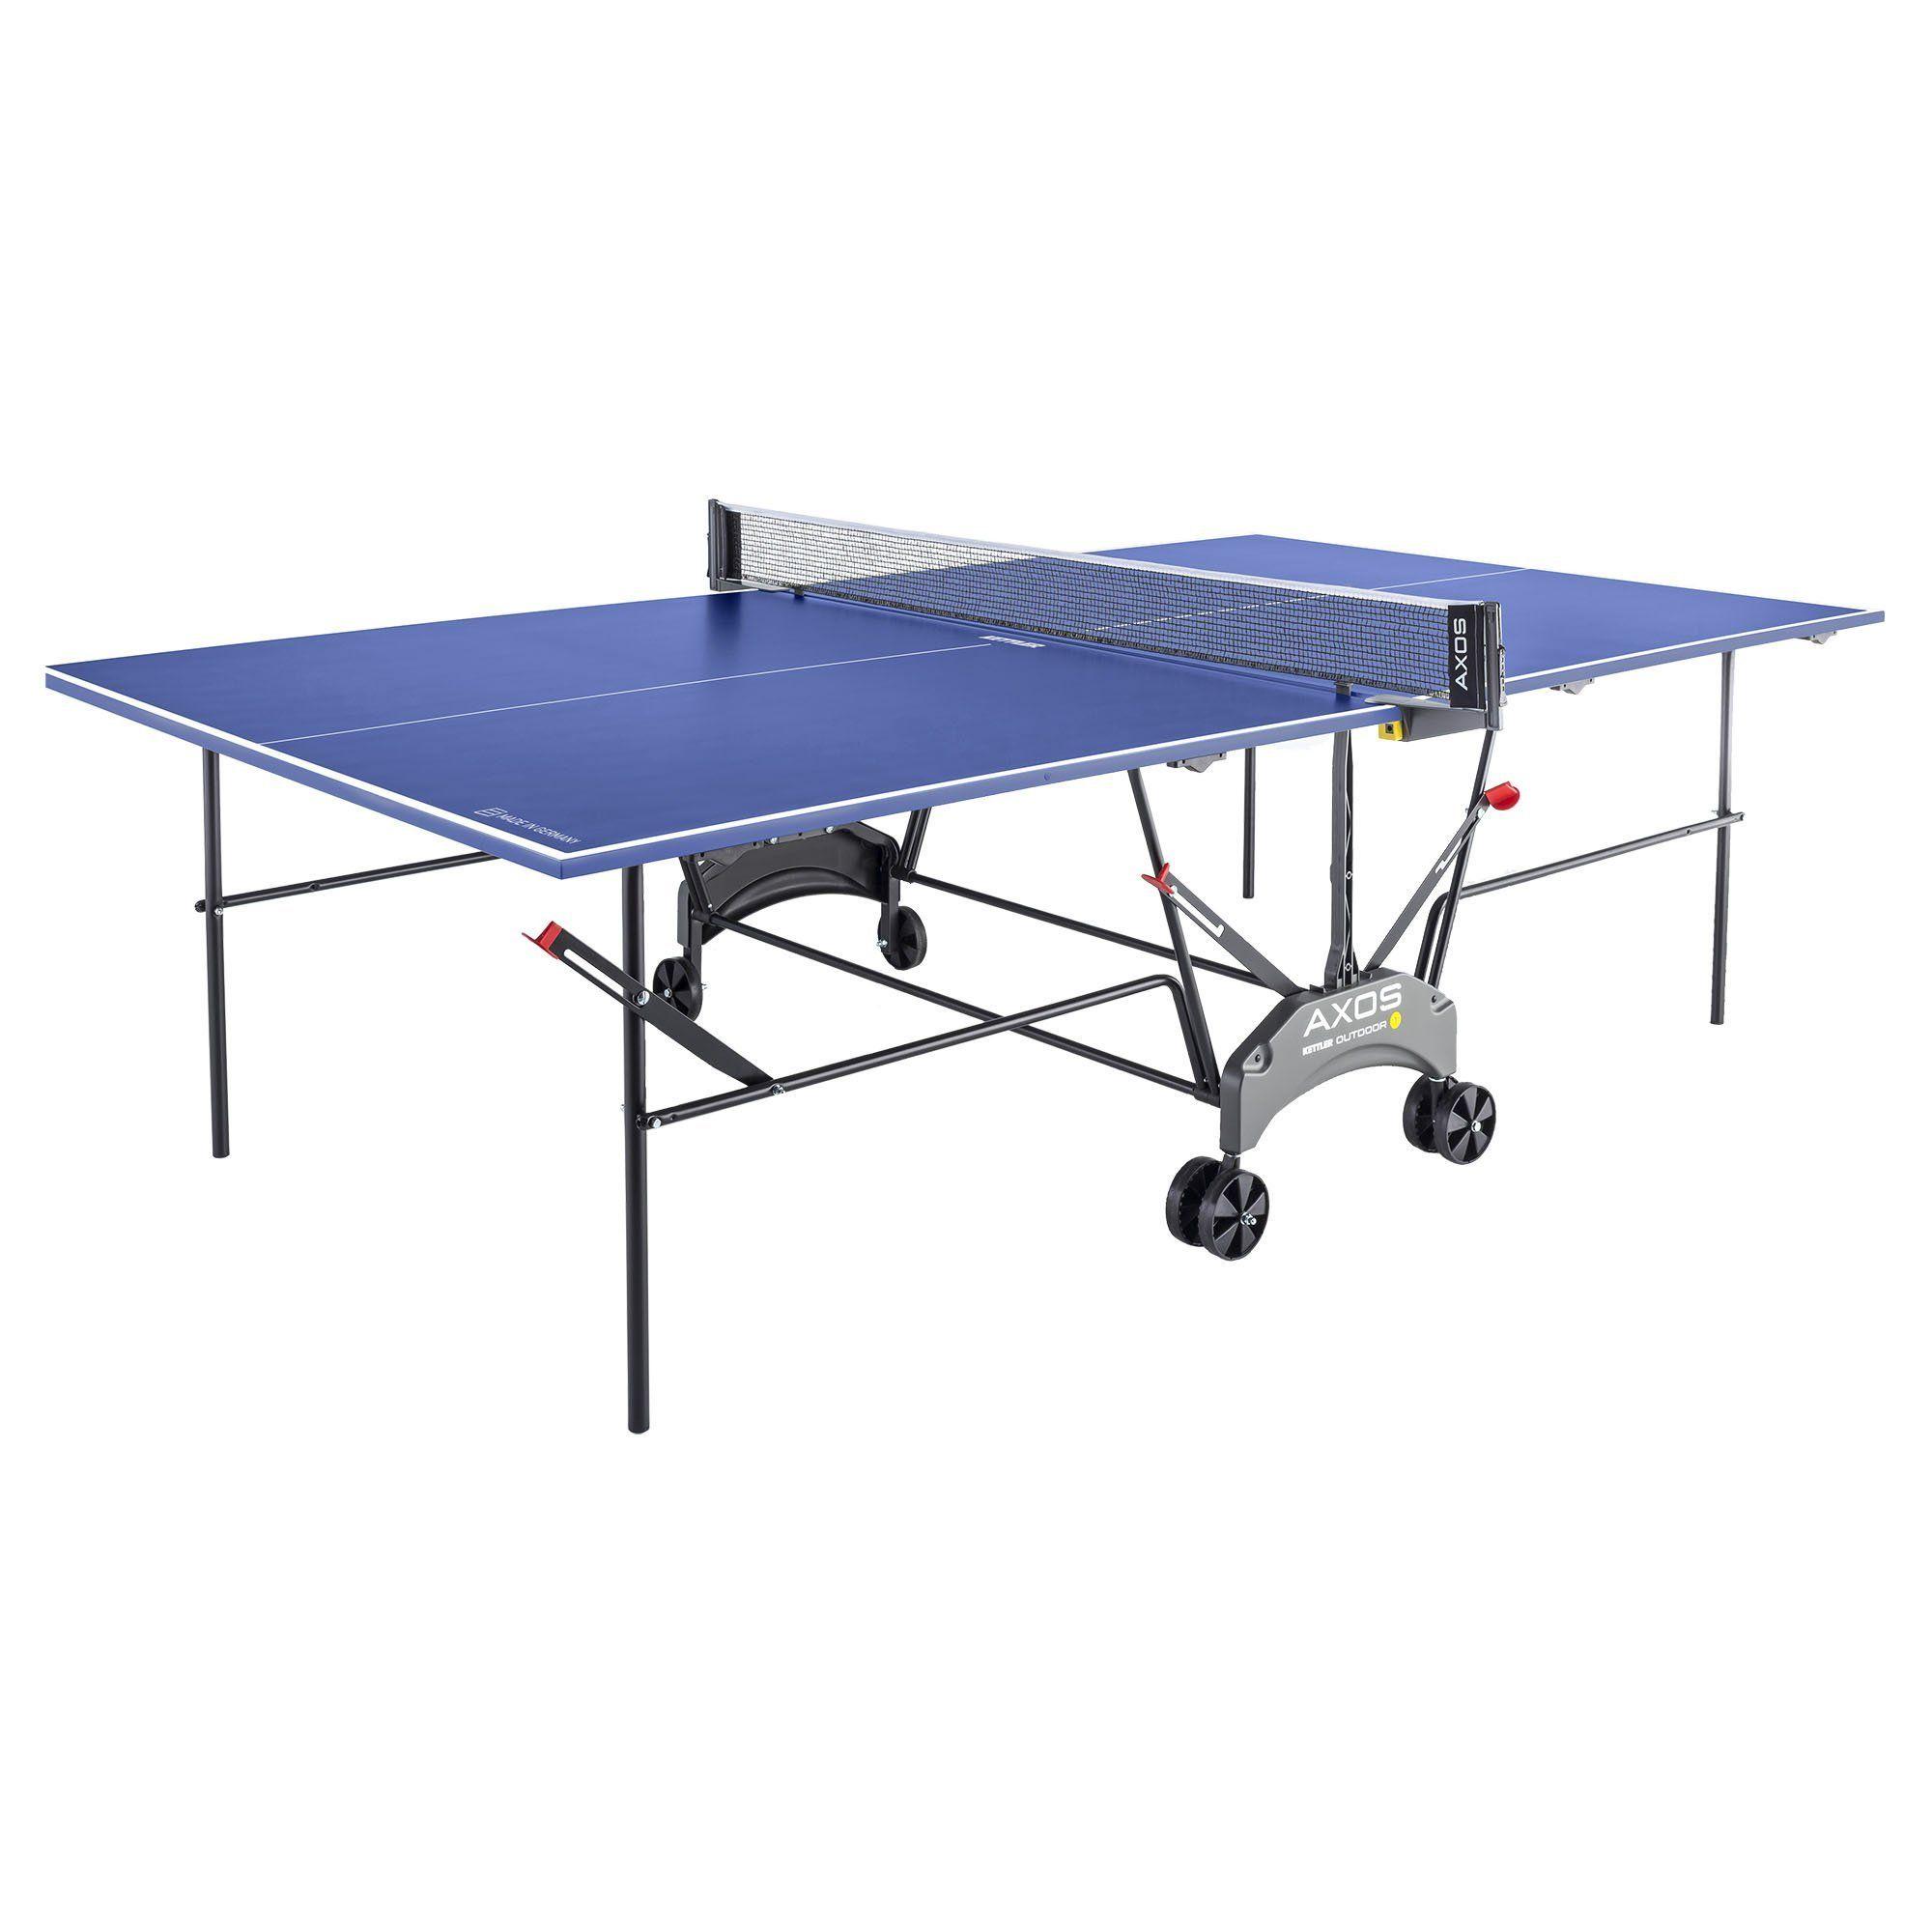 Kettler TT Platte AXOS Outdoor 1 Blau/weiß 07047 950